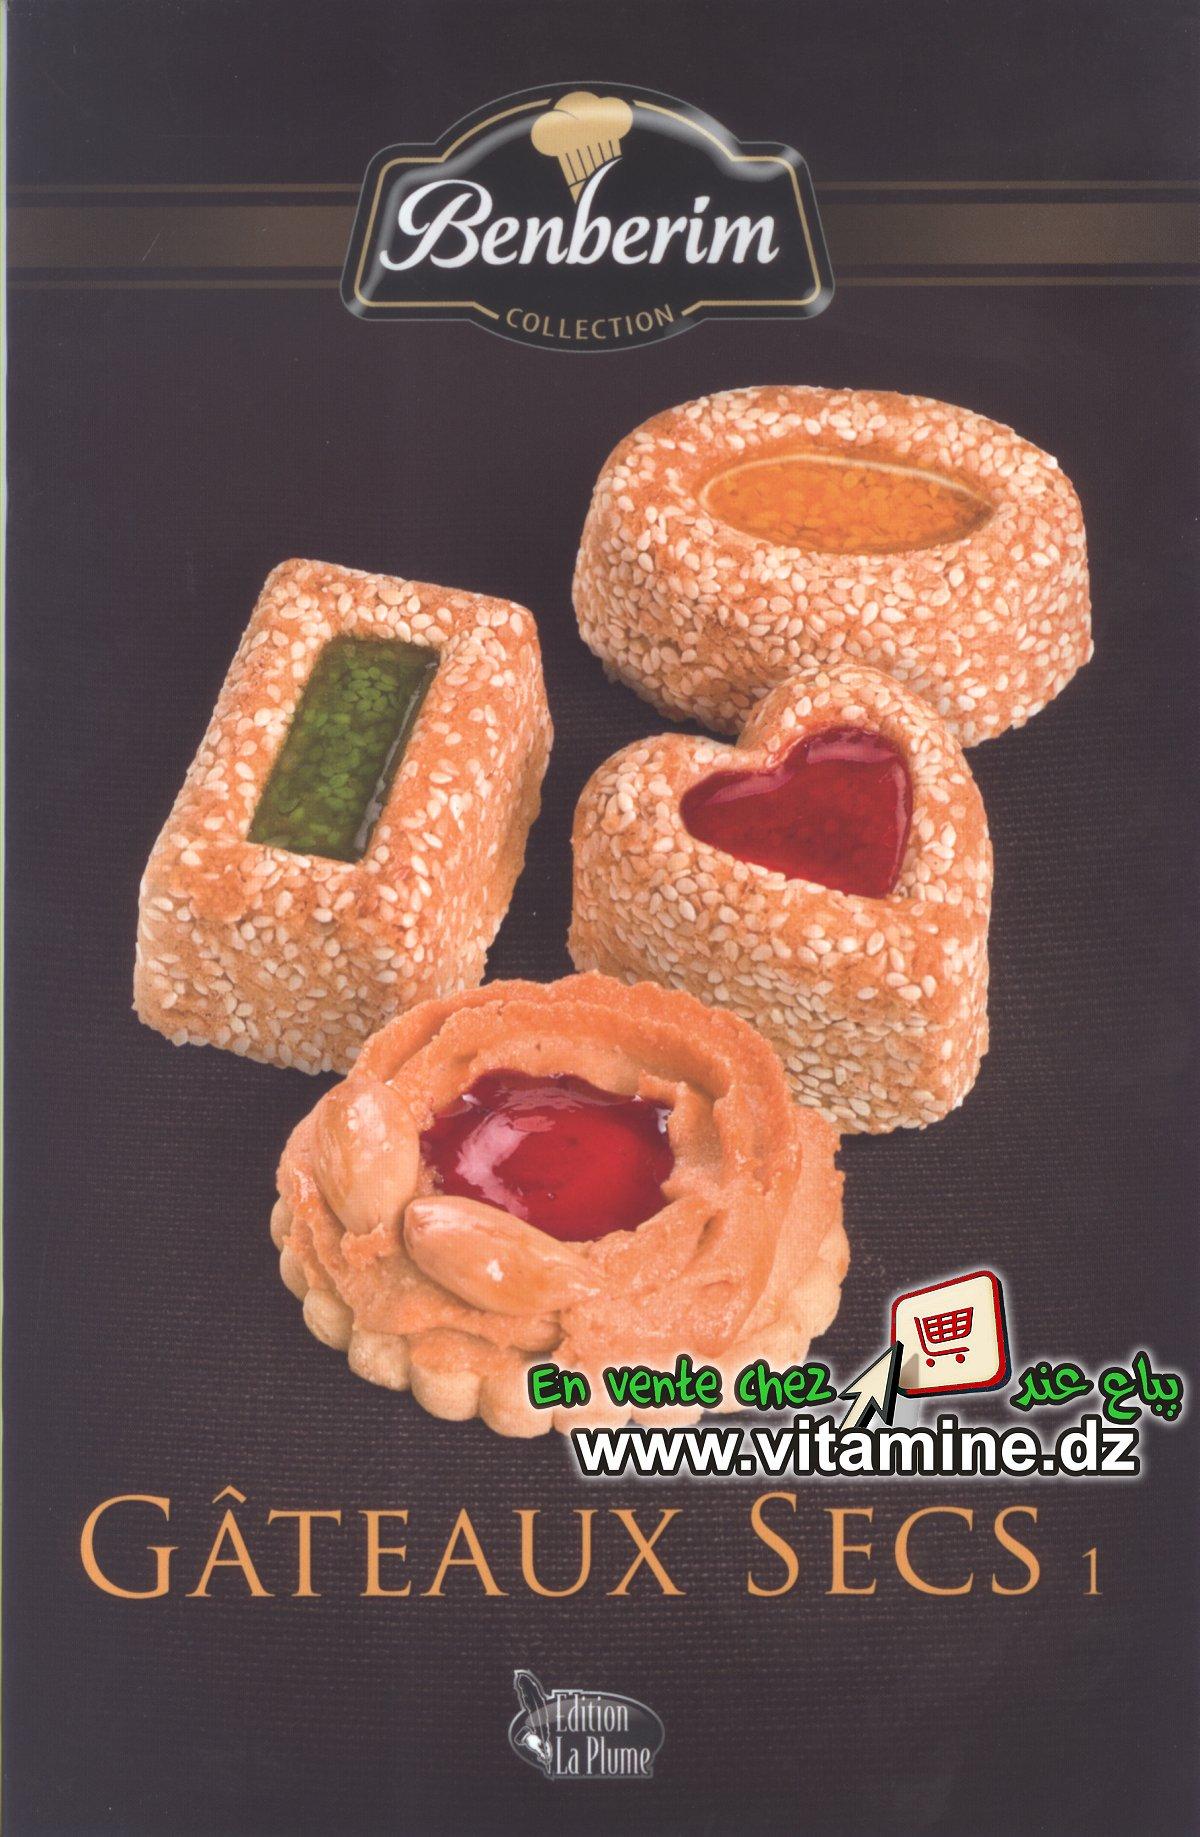 BENBERIM Saïda - Gâteaux secs 1